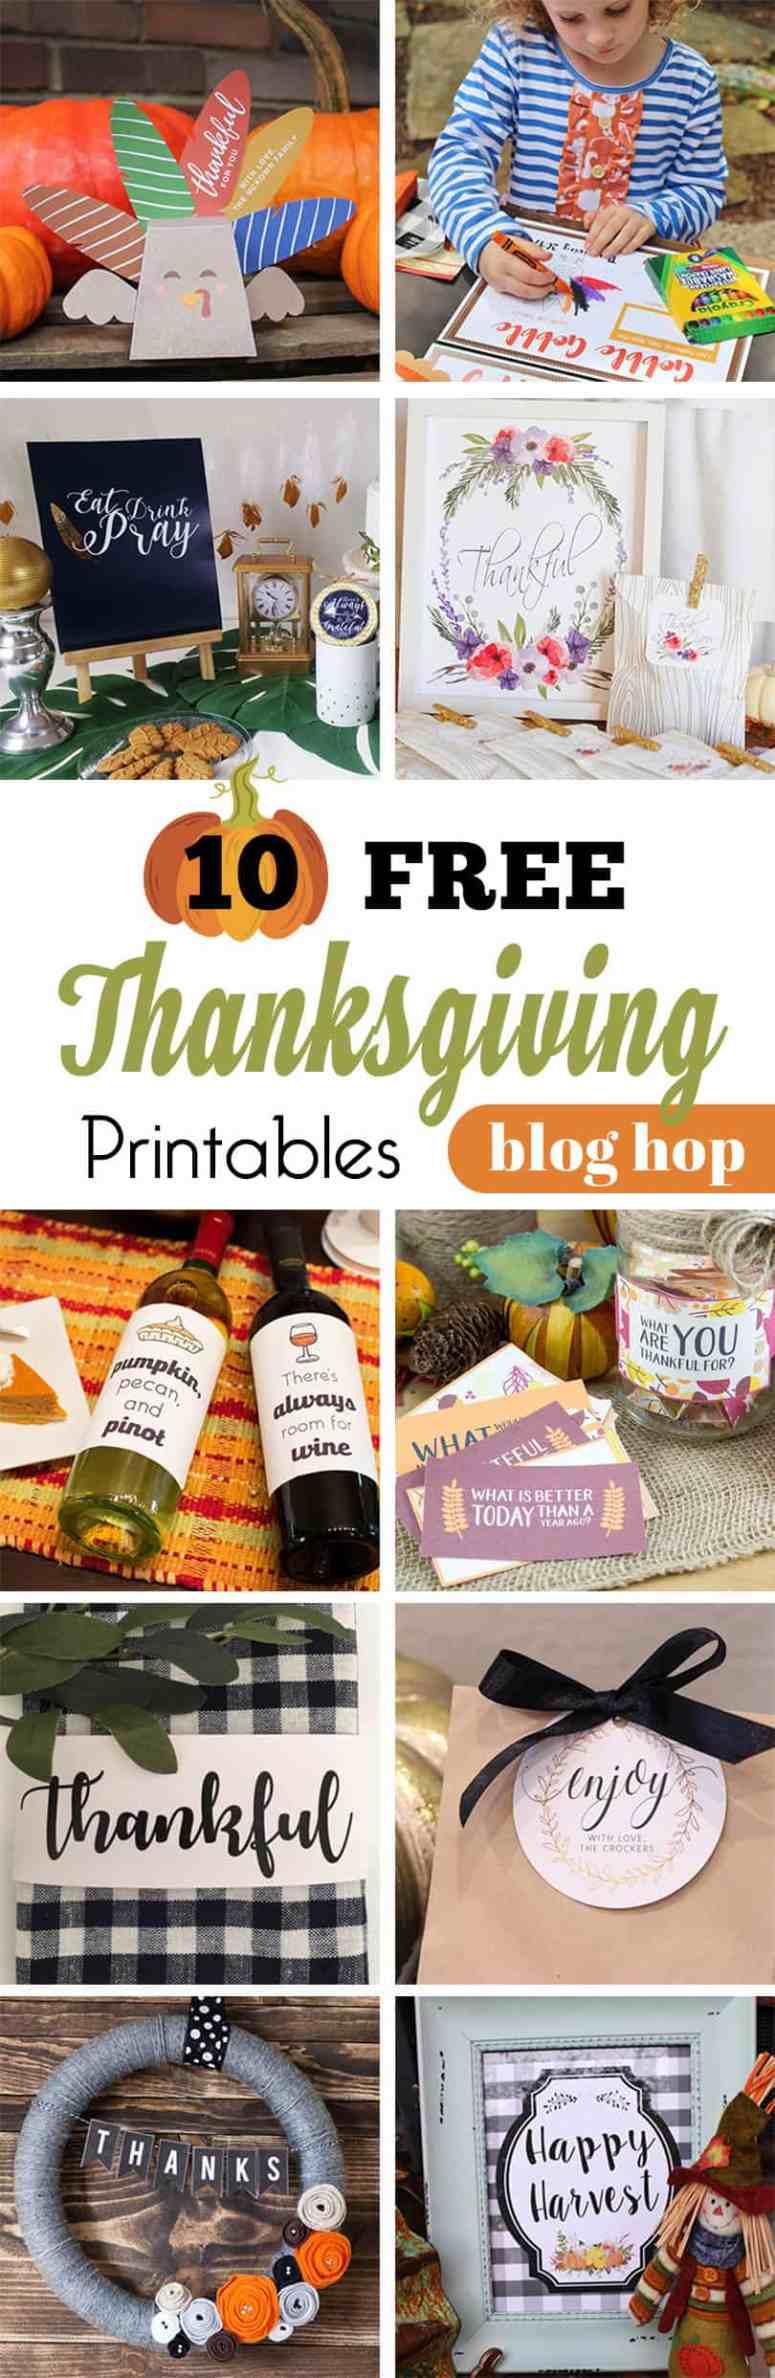 Free Thanksgiving Printables Blog Hop